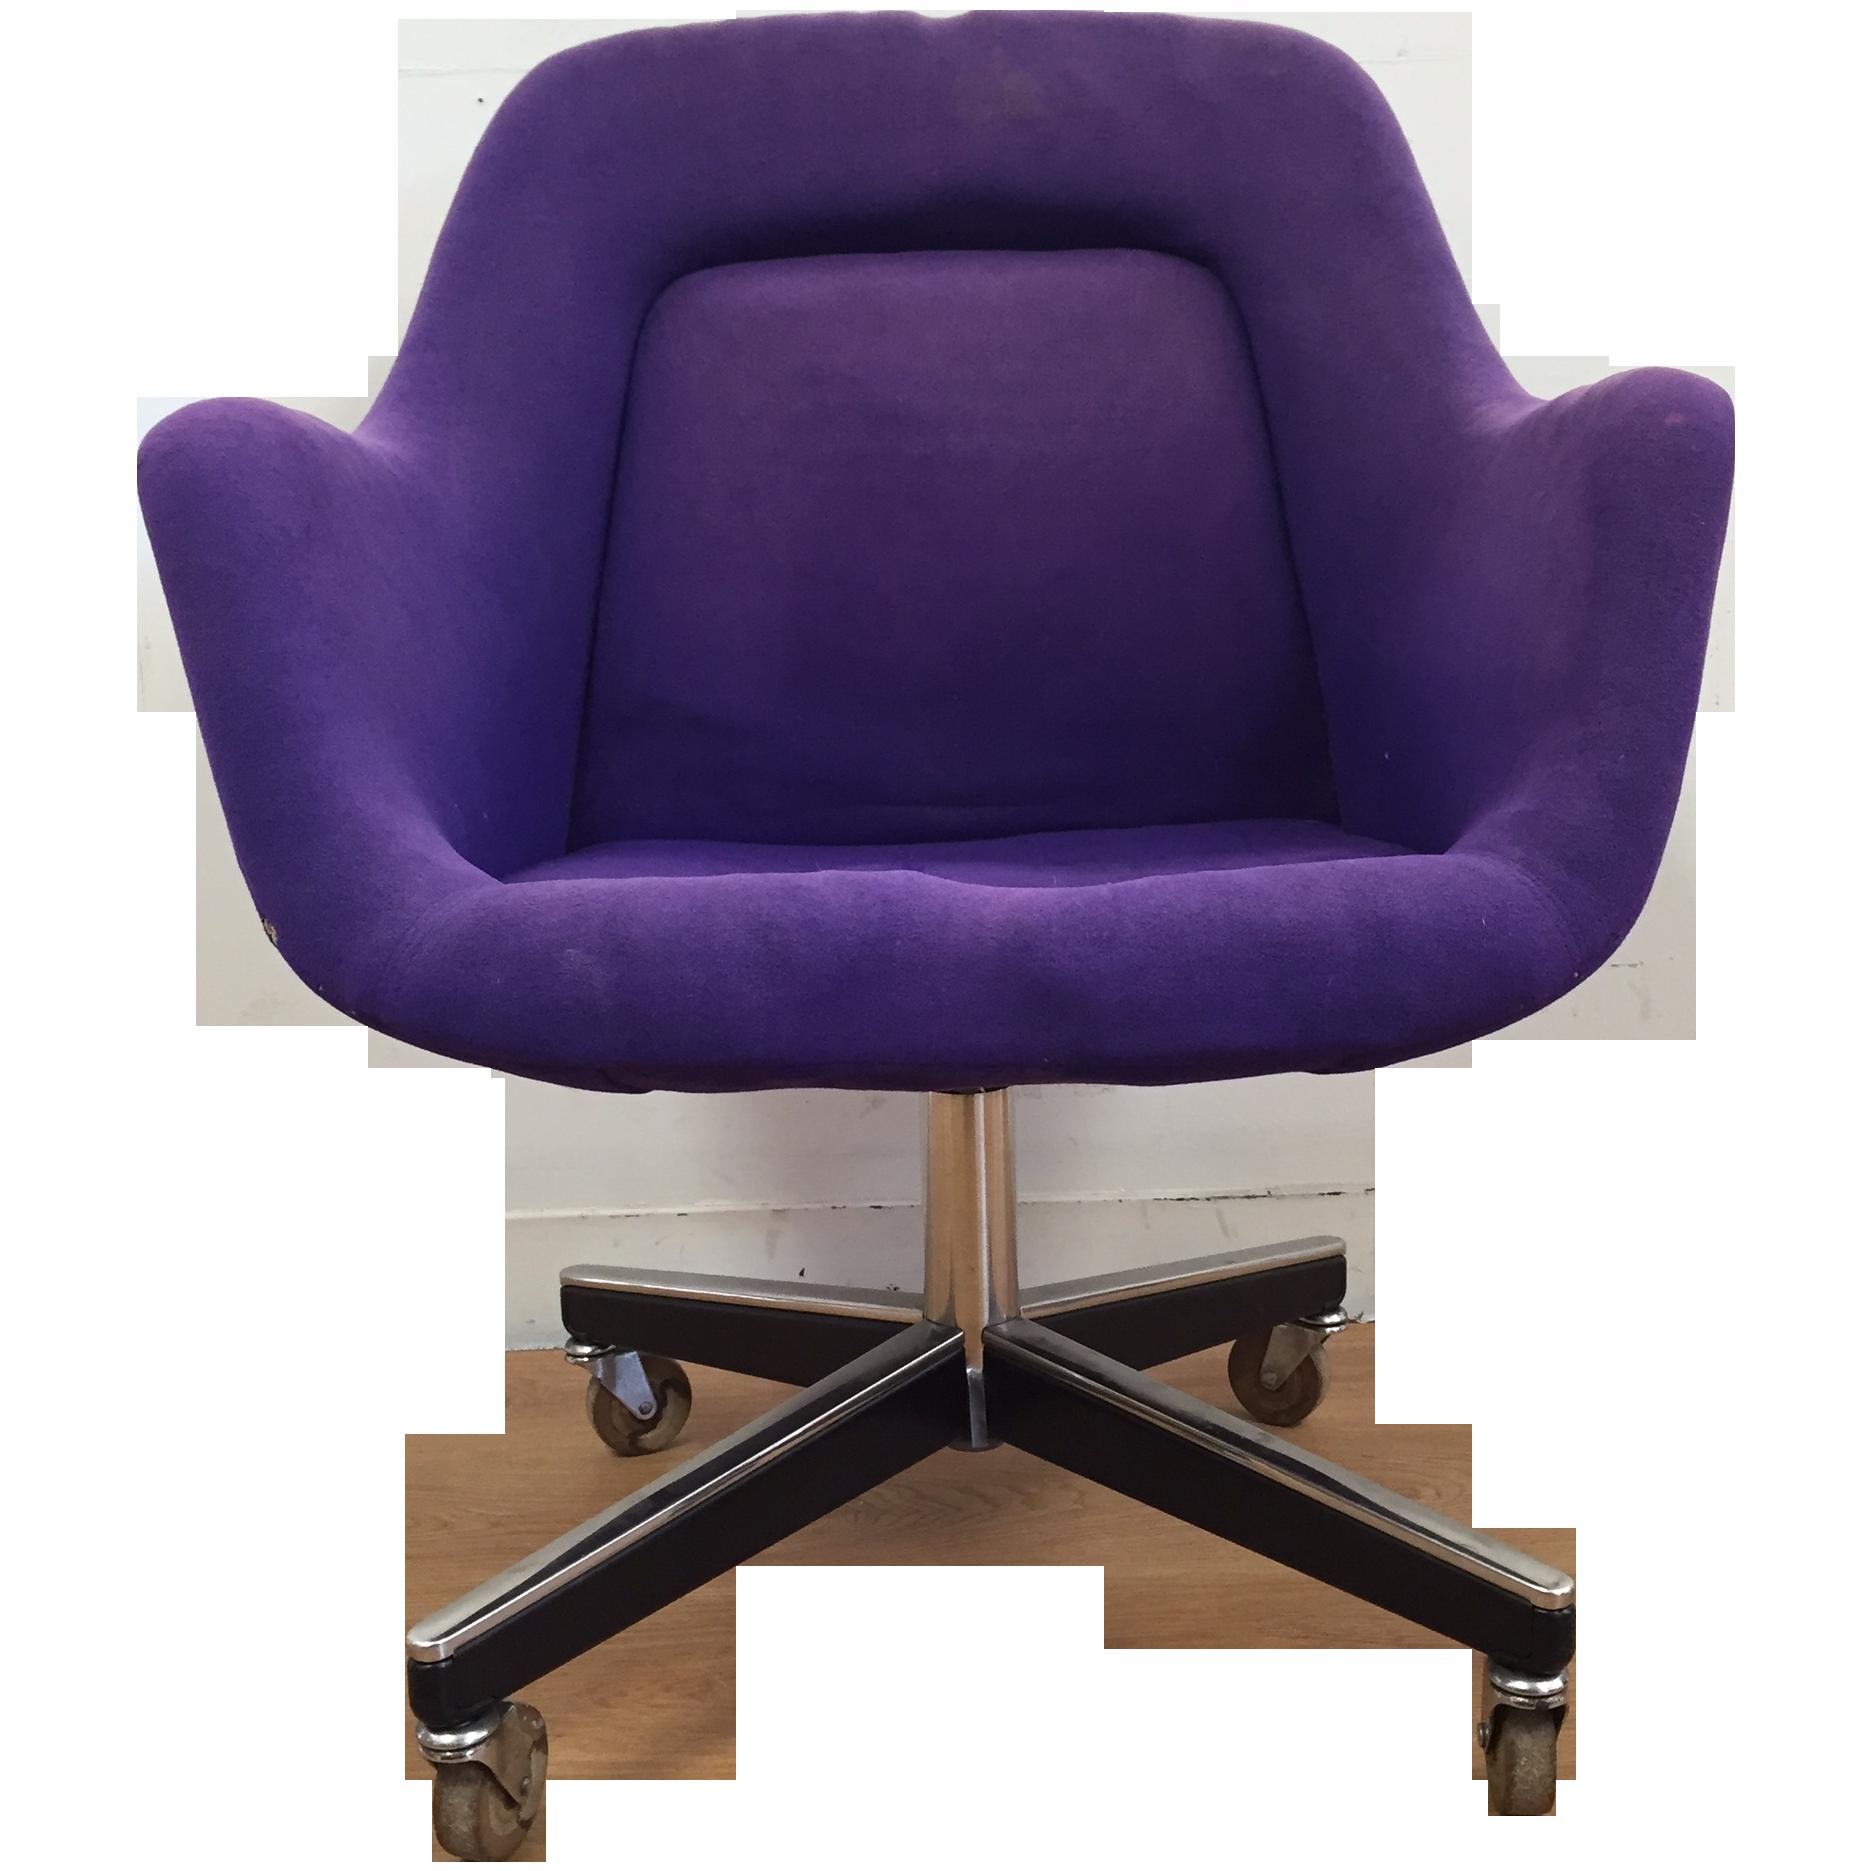 Unique Purple Chairs Rtty1 Com Rtty1 Com